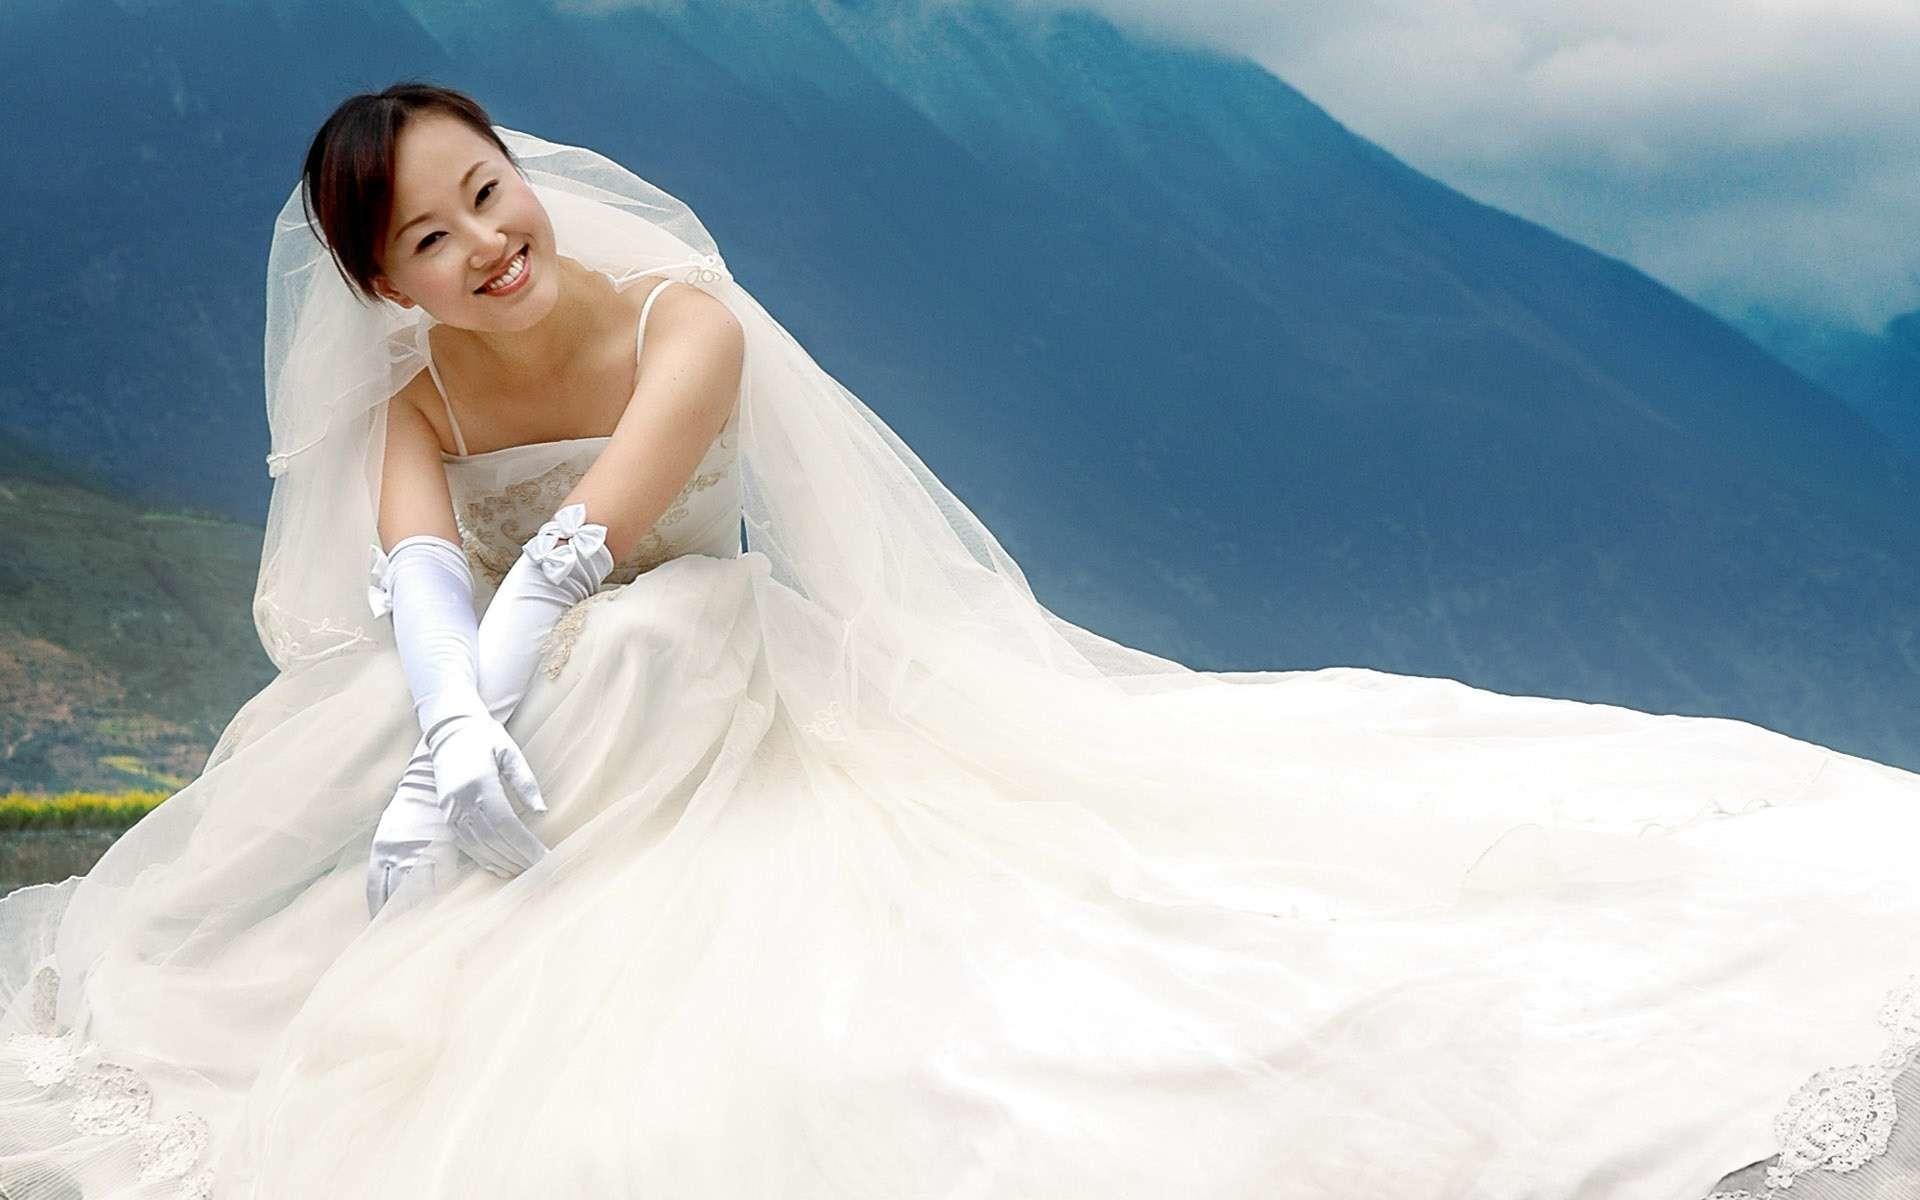 Beautiful Girls Wallpapers Funmag Beautiful Girl Eyes - Fb Profile Pic For Girl Hd New , HD Wallpaper & Backgrounds